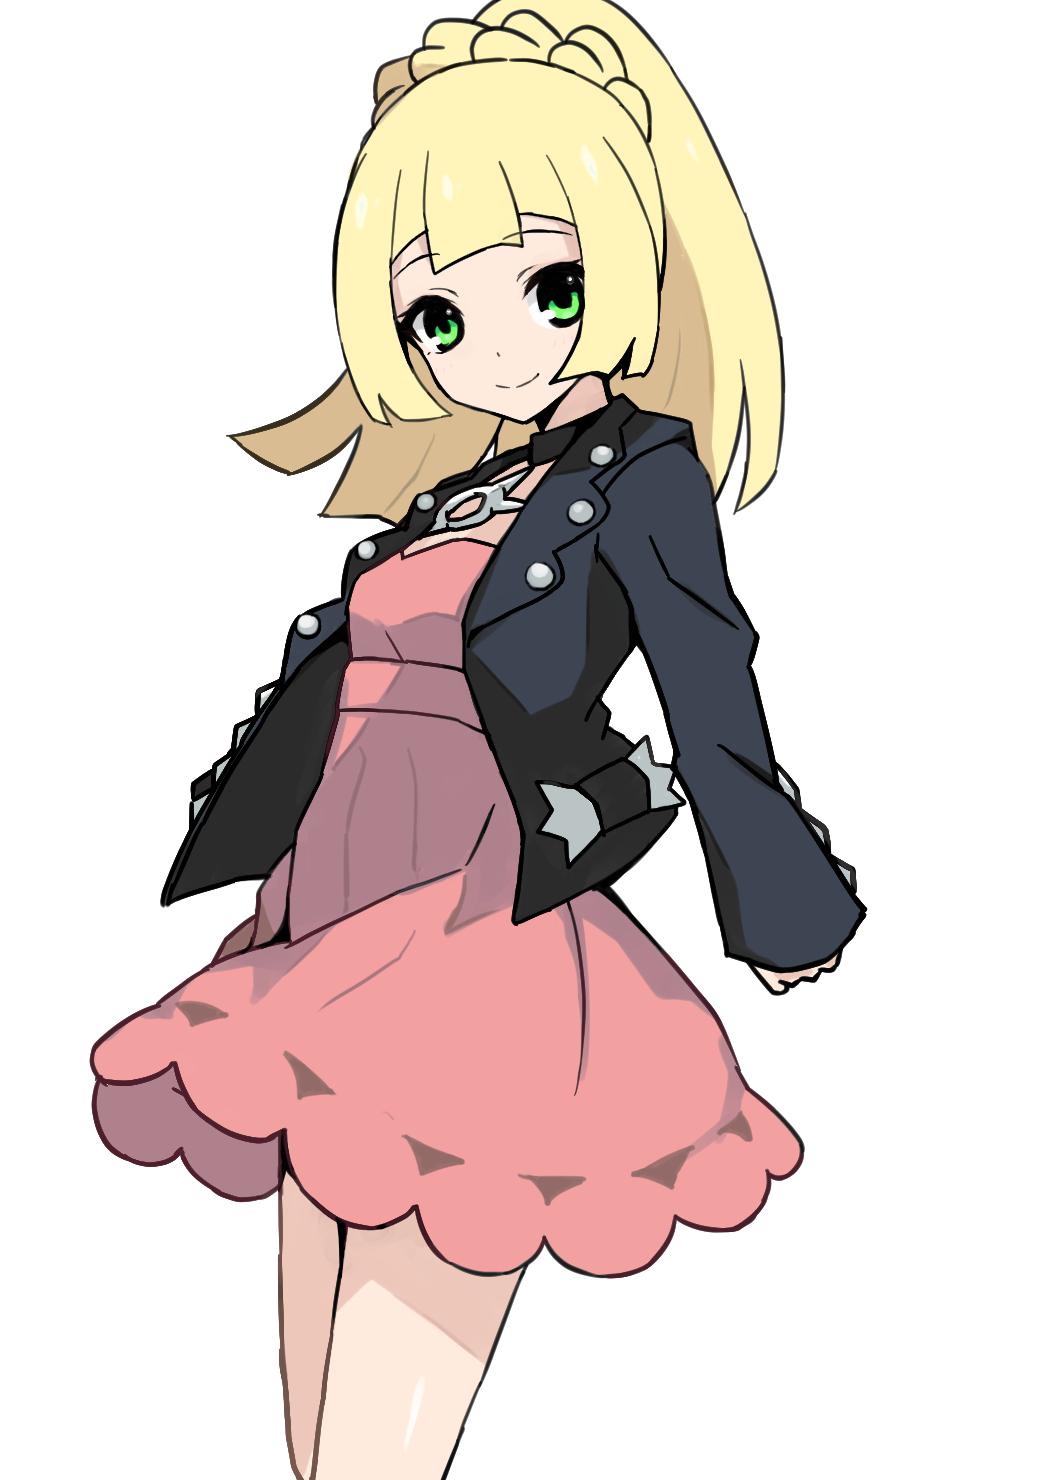 1girl black_jacket blonde_hair closed_mouth cosplay dress green_eyes highres jacket lillie_(pokemon) long_hair long_sleeves mary_(pokemon) mary_(pokemon)_(cosplay) melon_syrup pink_dress pokemon pokemon_(game) pokemon_sm pokemon_swsh ponytail simple_background smile solo white_background